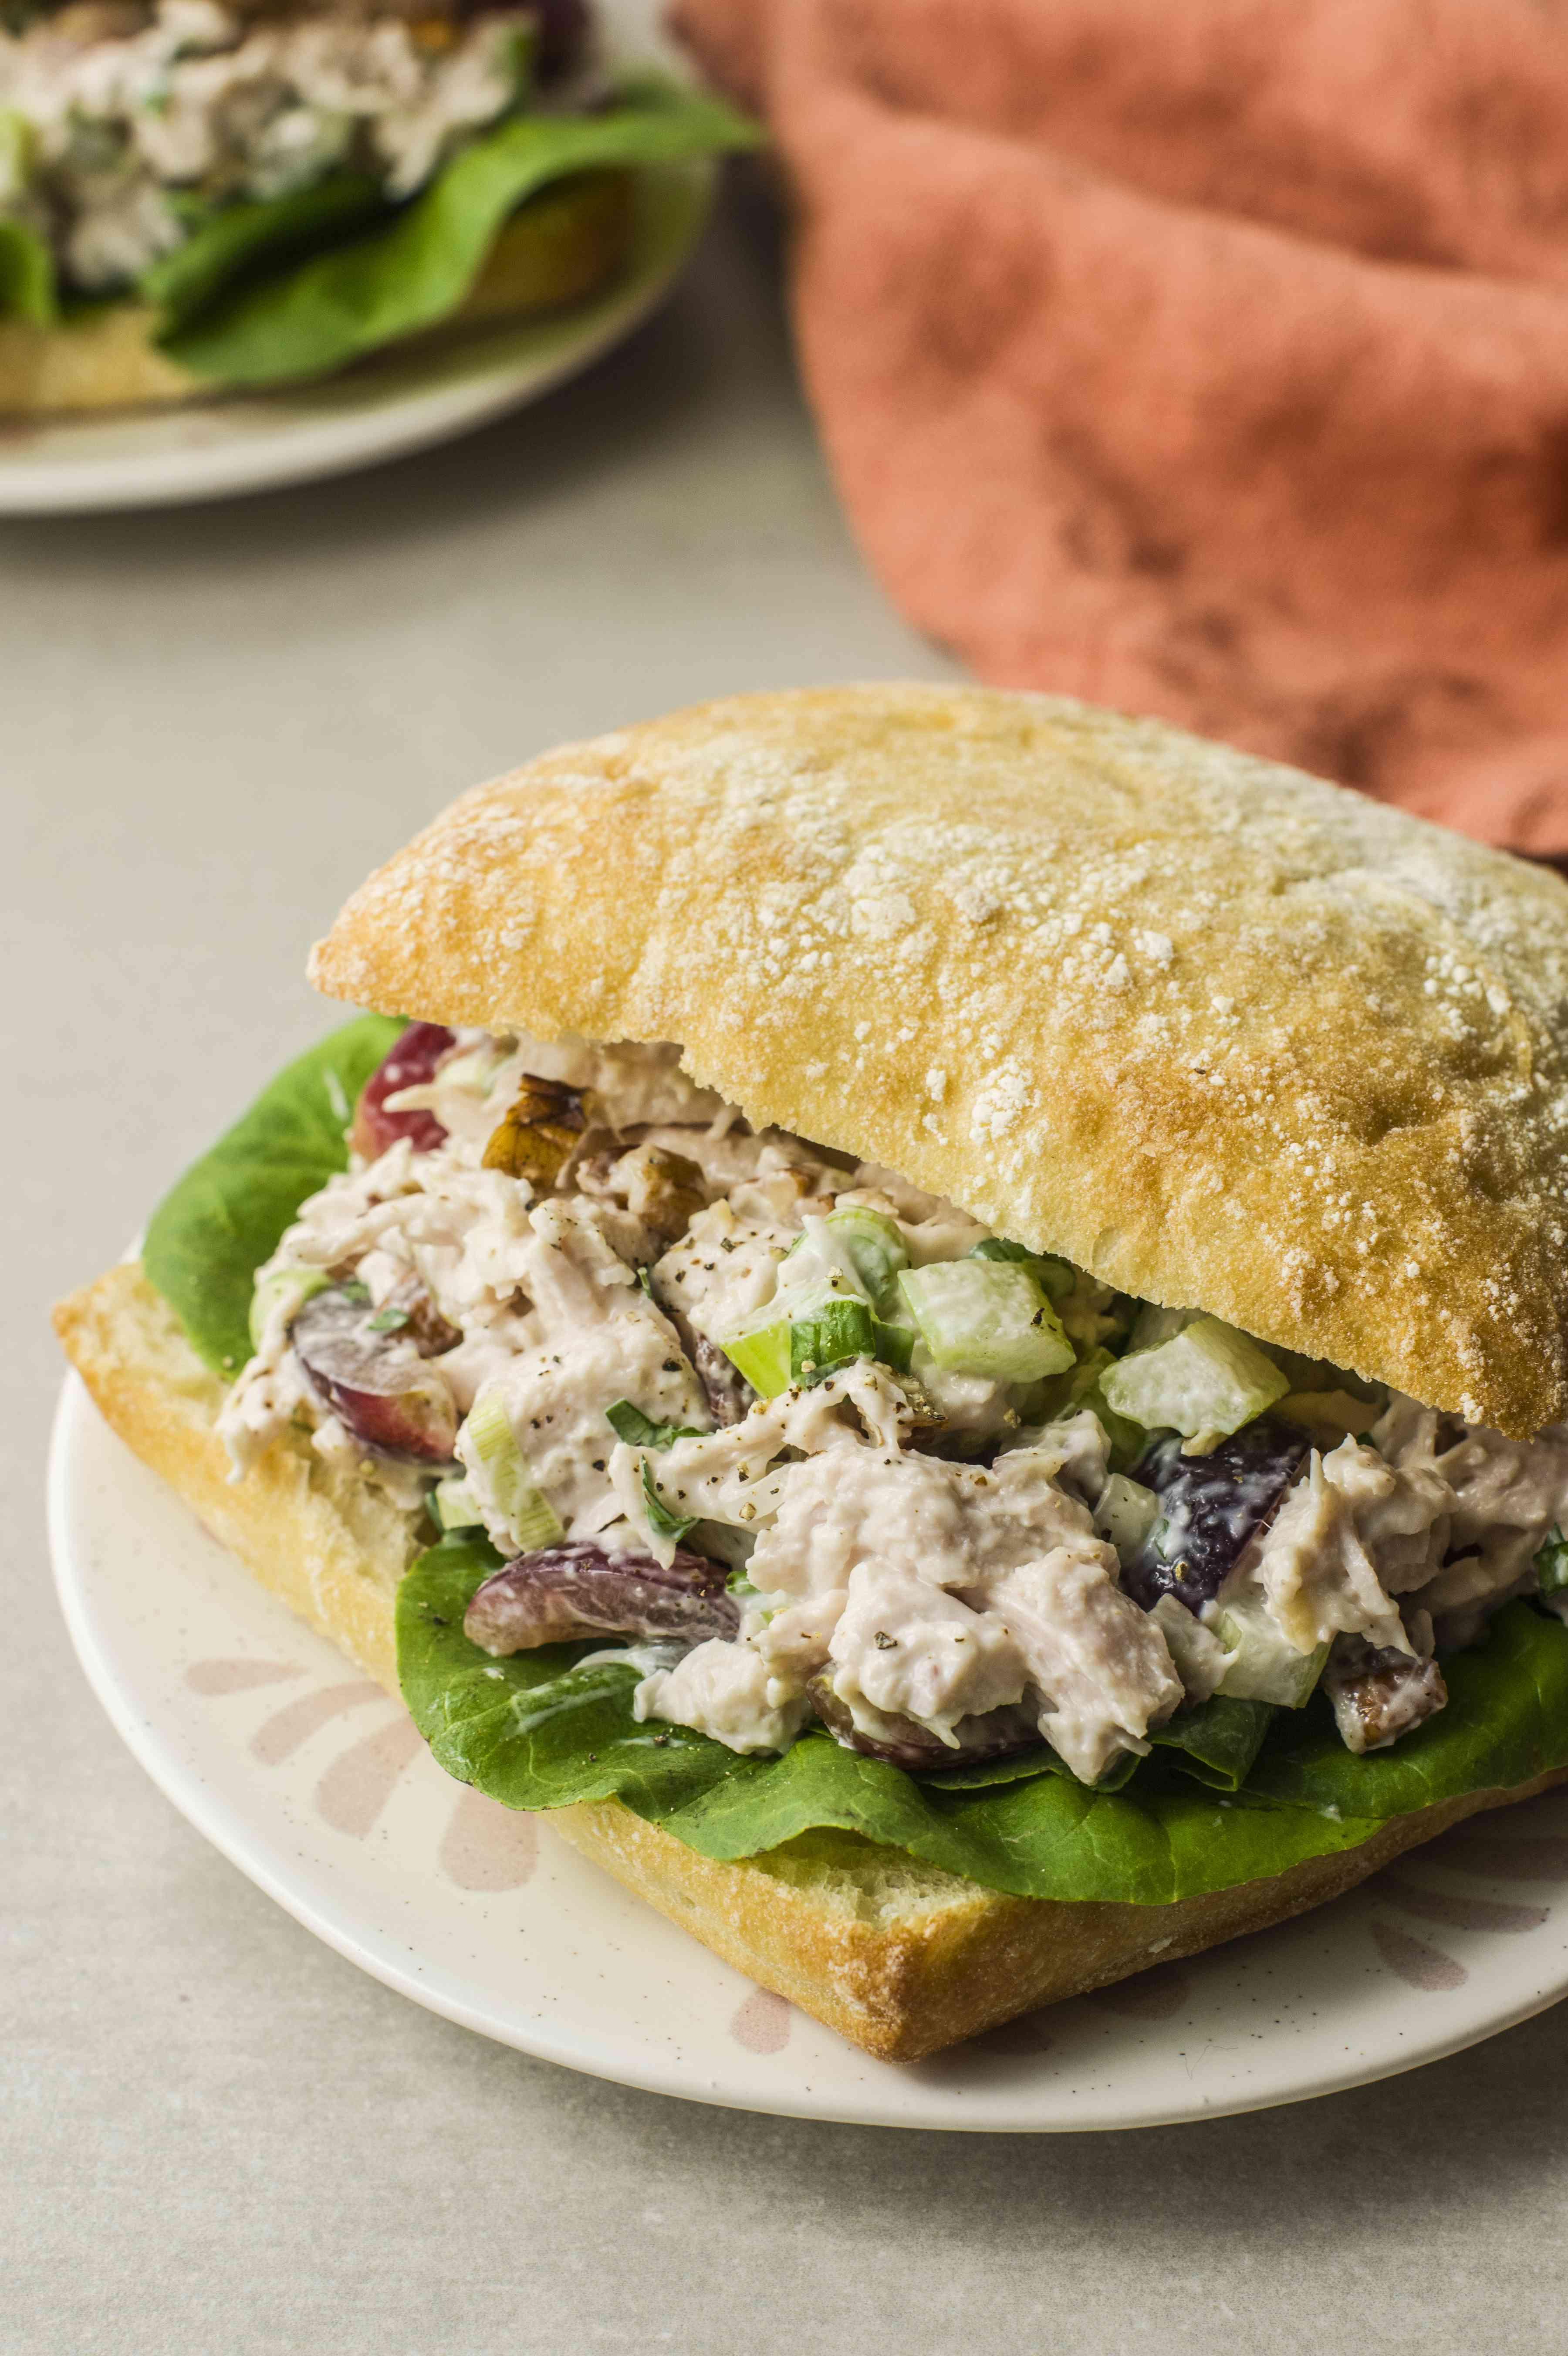 Serve on sandwiches